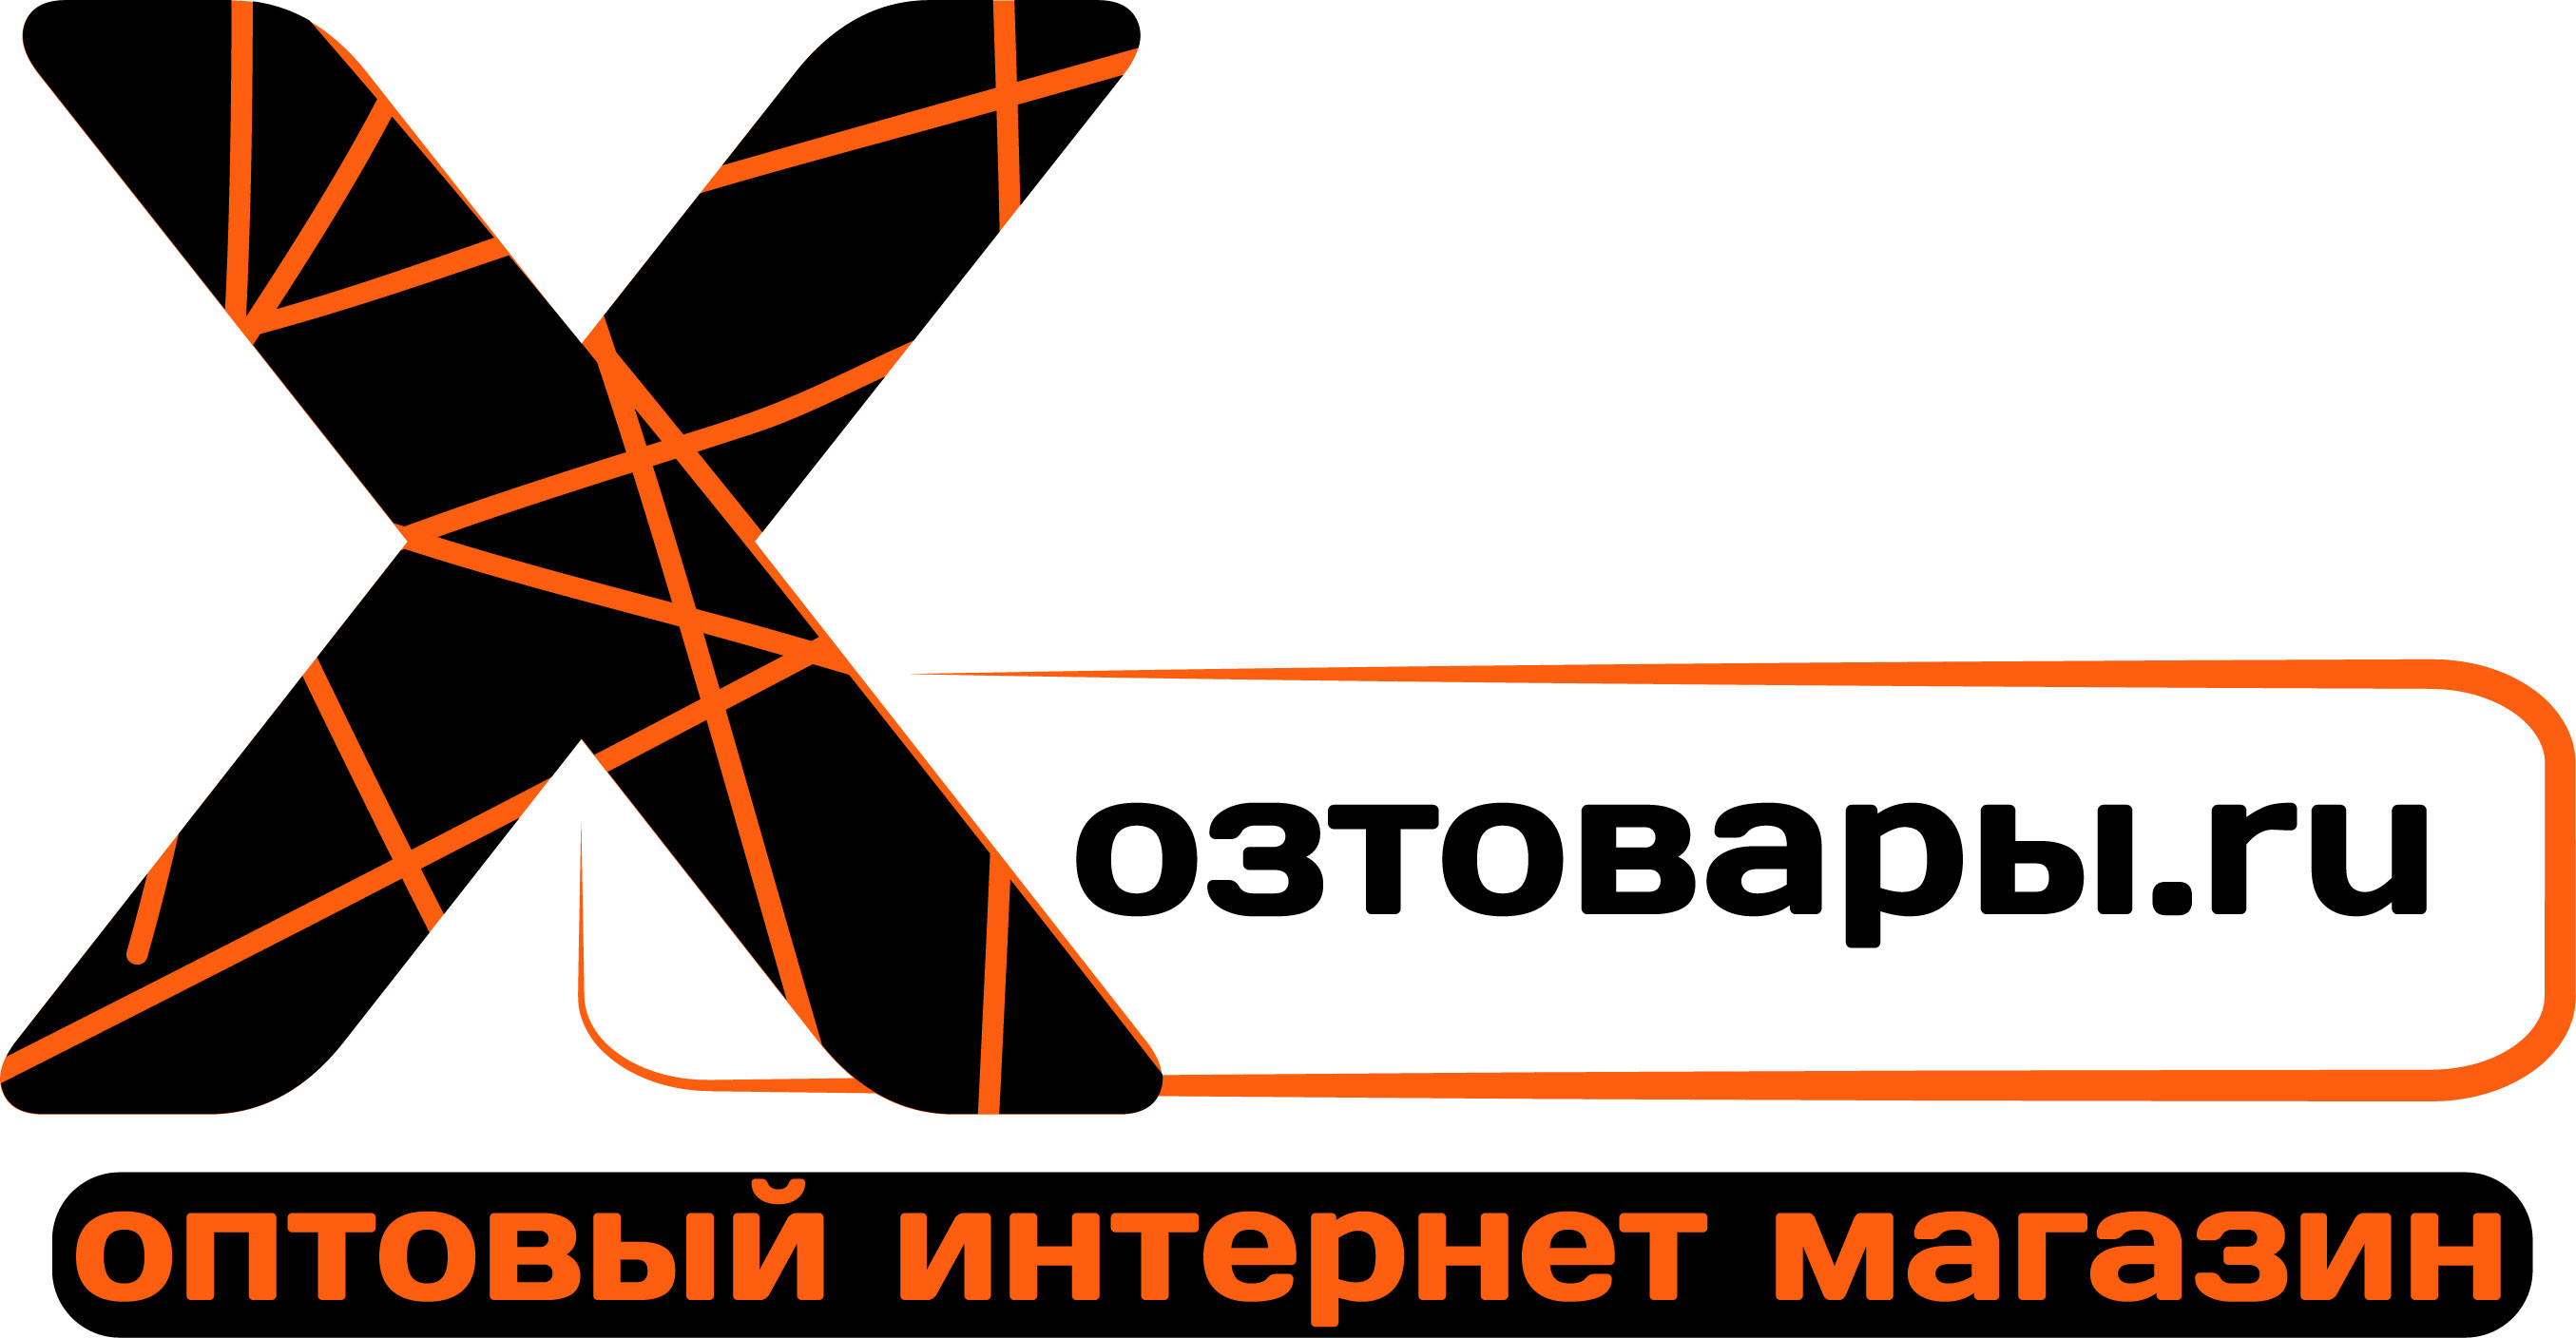 Разработка логотипа для оптового интернет-магазина «Хозтовары.ру» фото f_949606c9133e9734.jpg